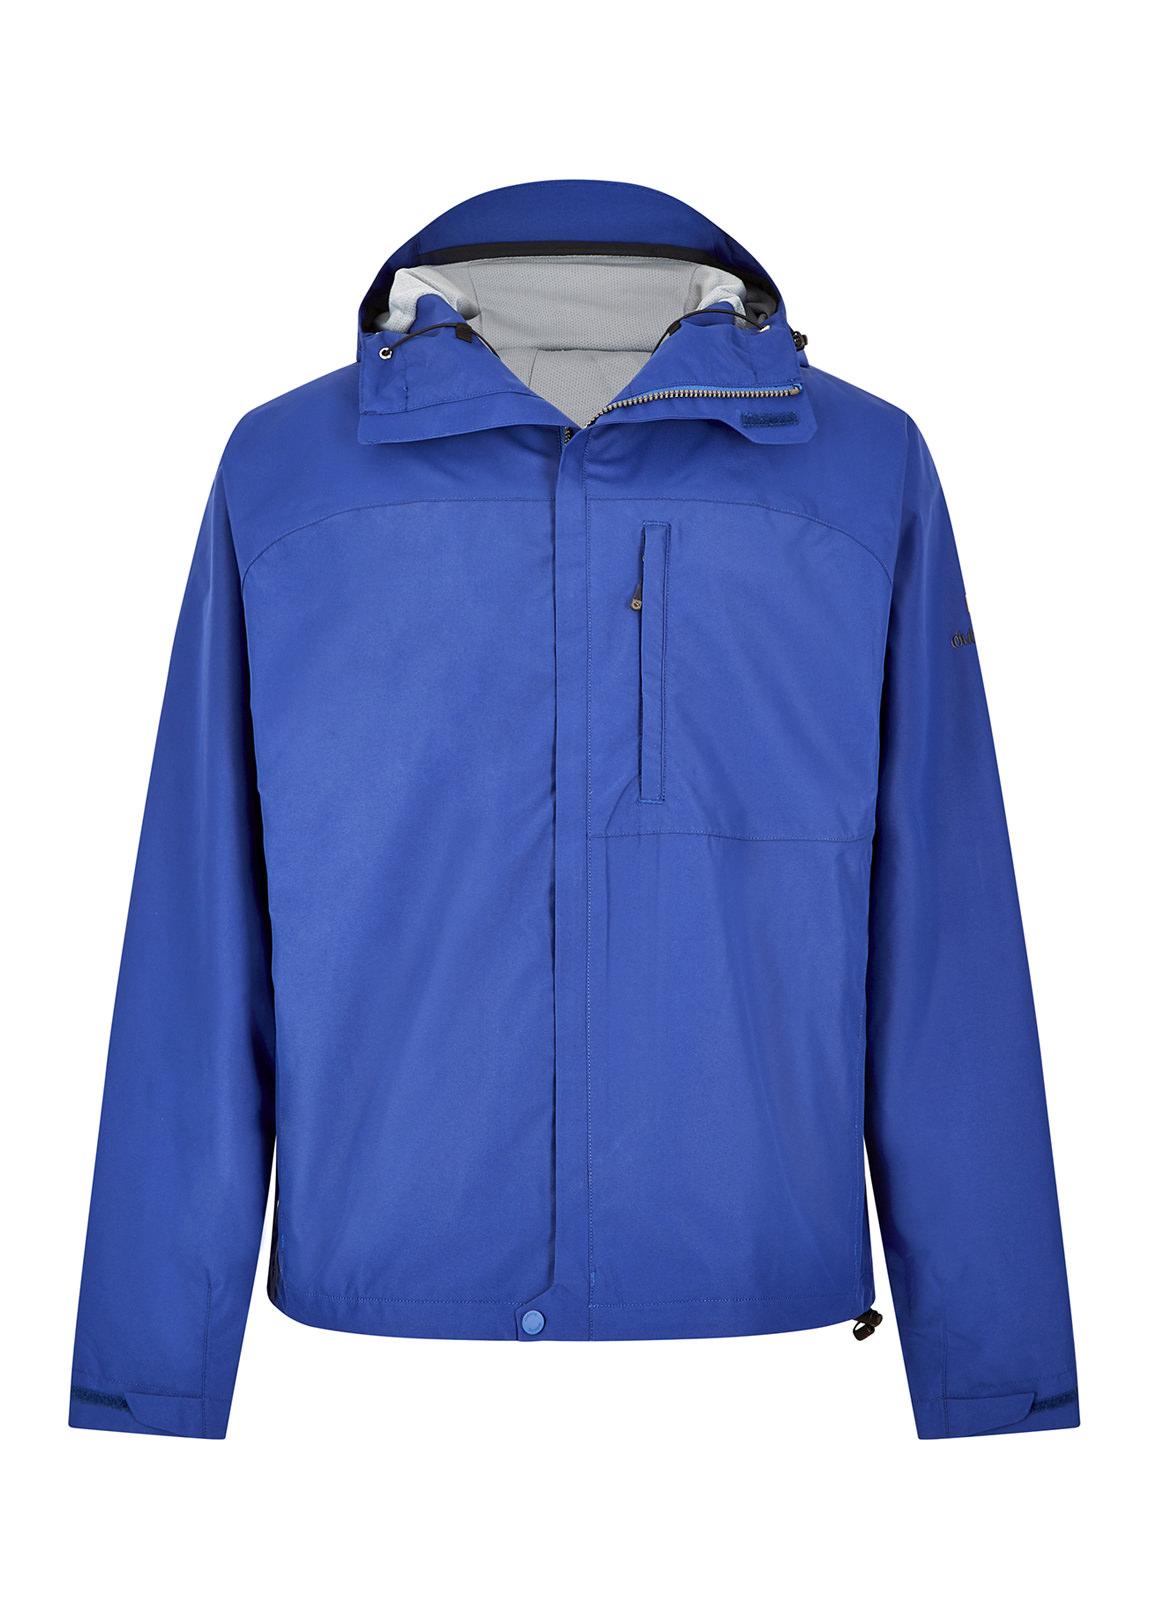 Dubarry_Ballycumber Jacket - Royal Blue_Image_2